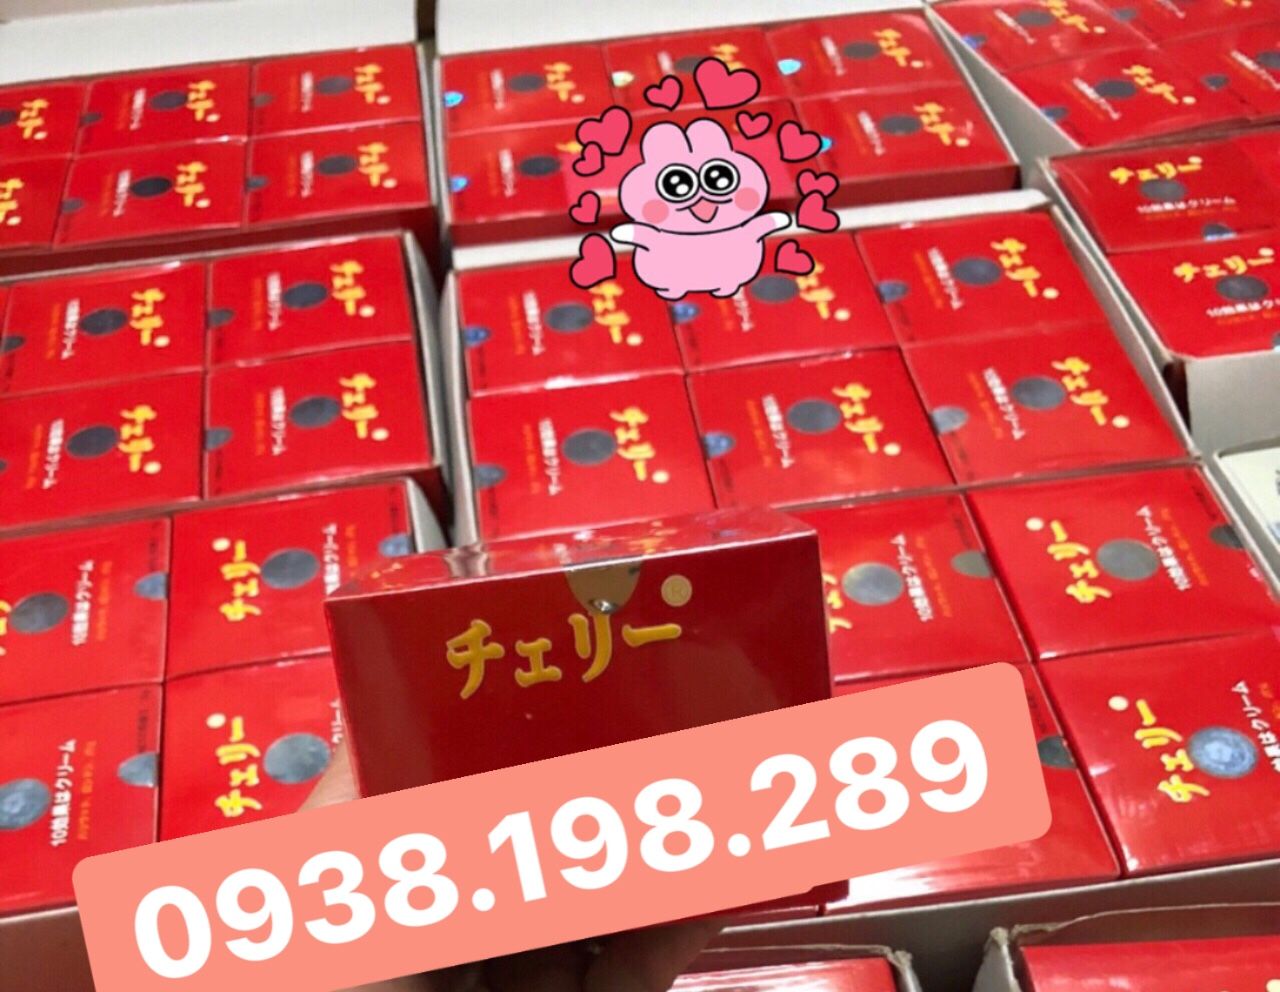 cham-soc-mat-kem-face-duong-trang-da-hoa-anh-dao-nhat-ban-5583